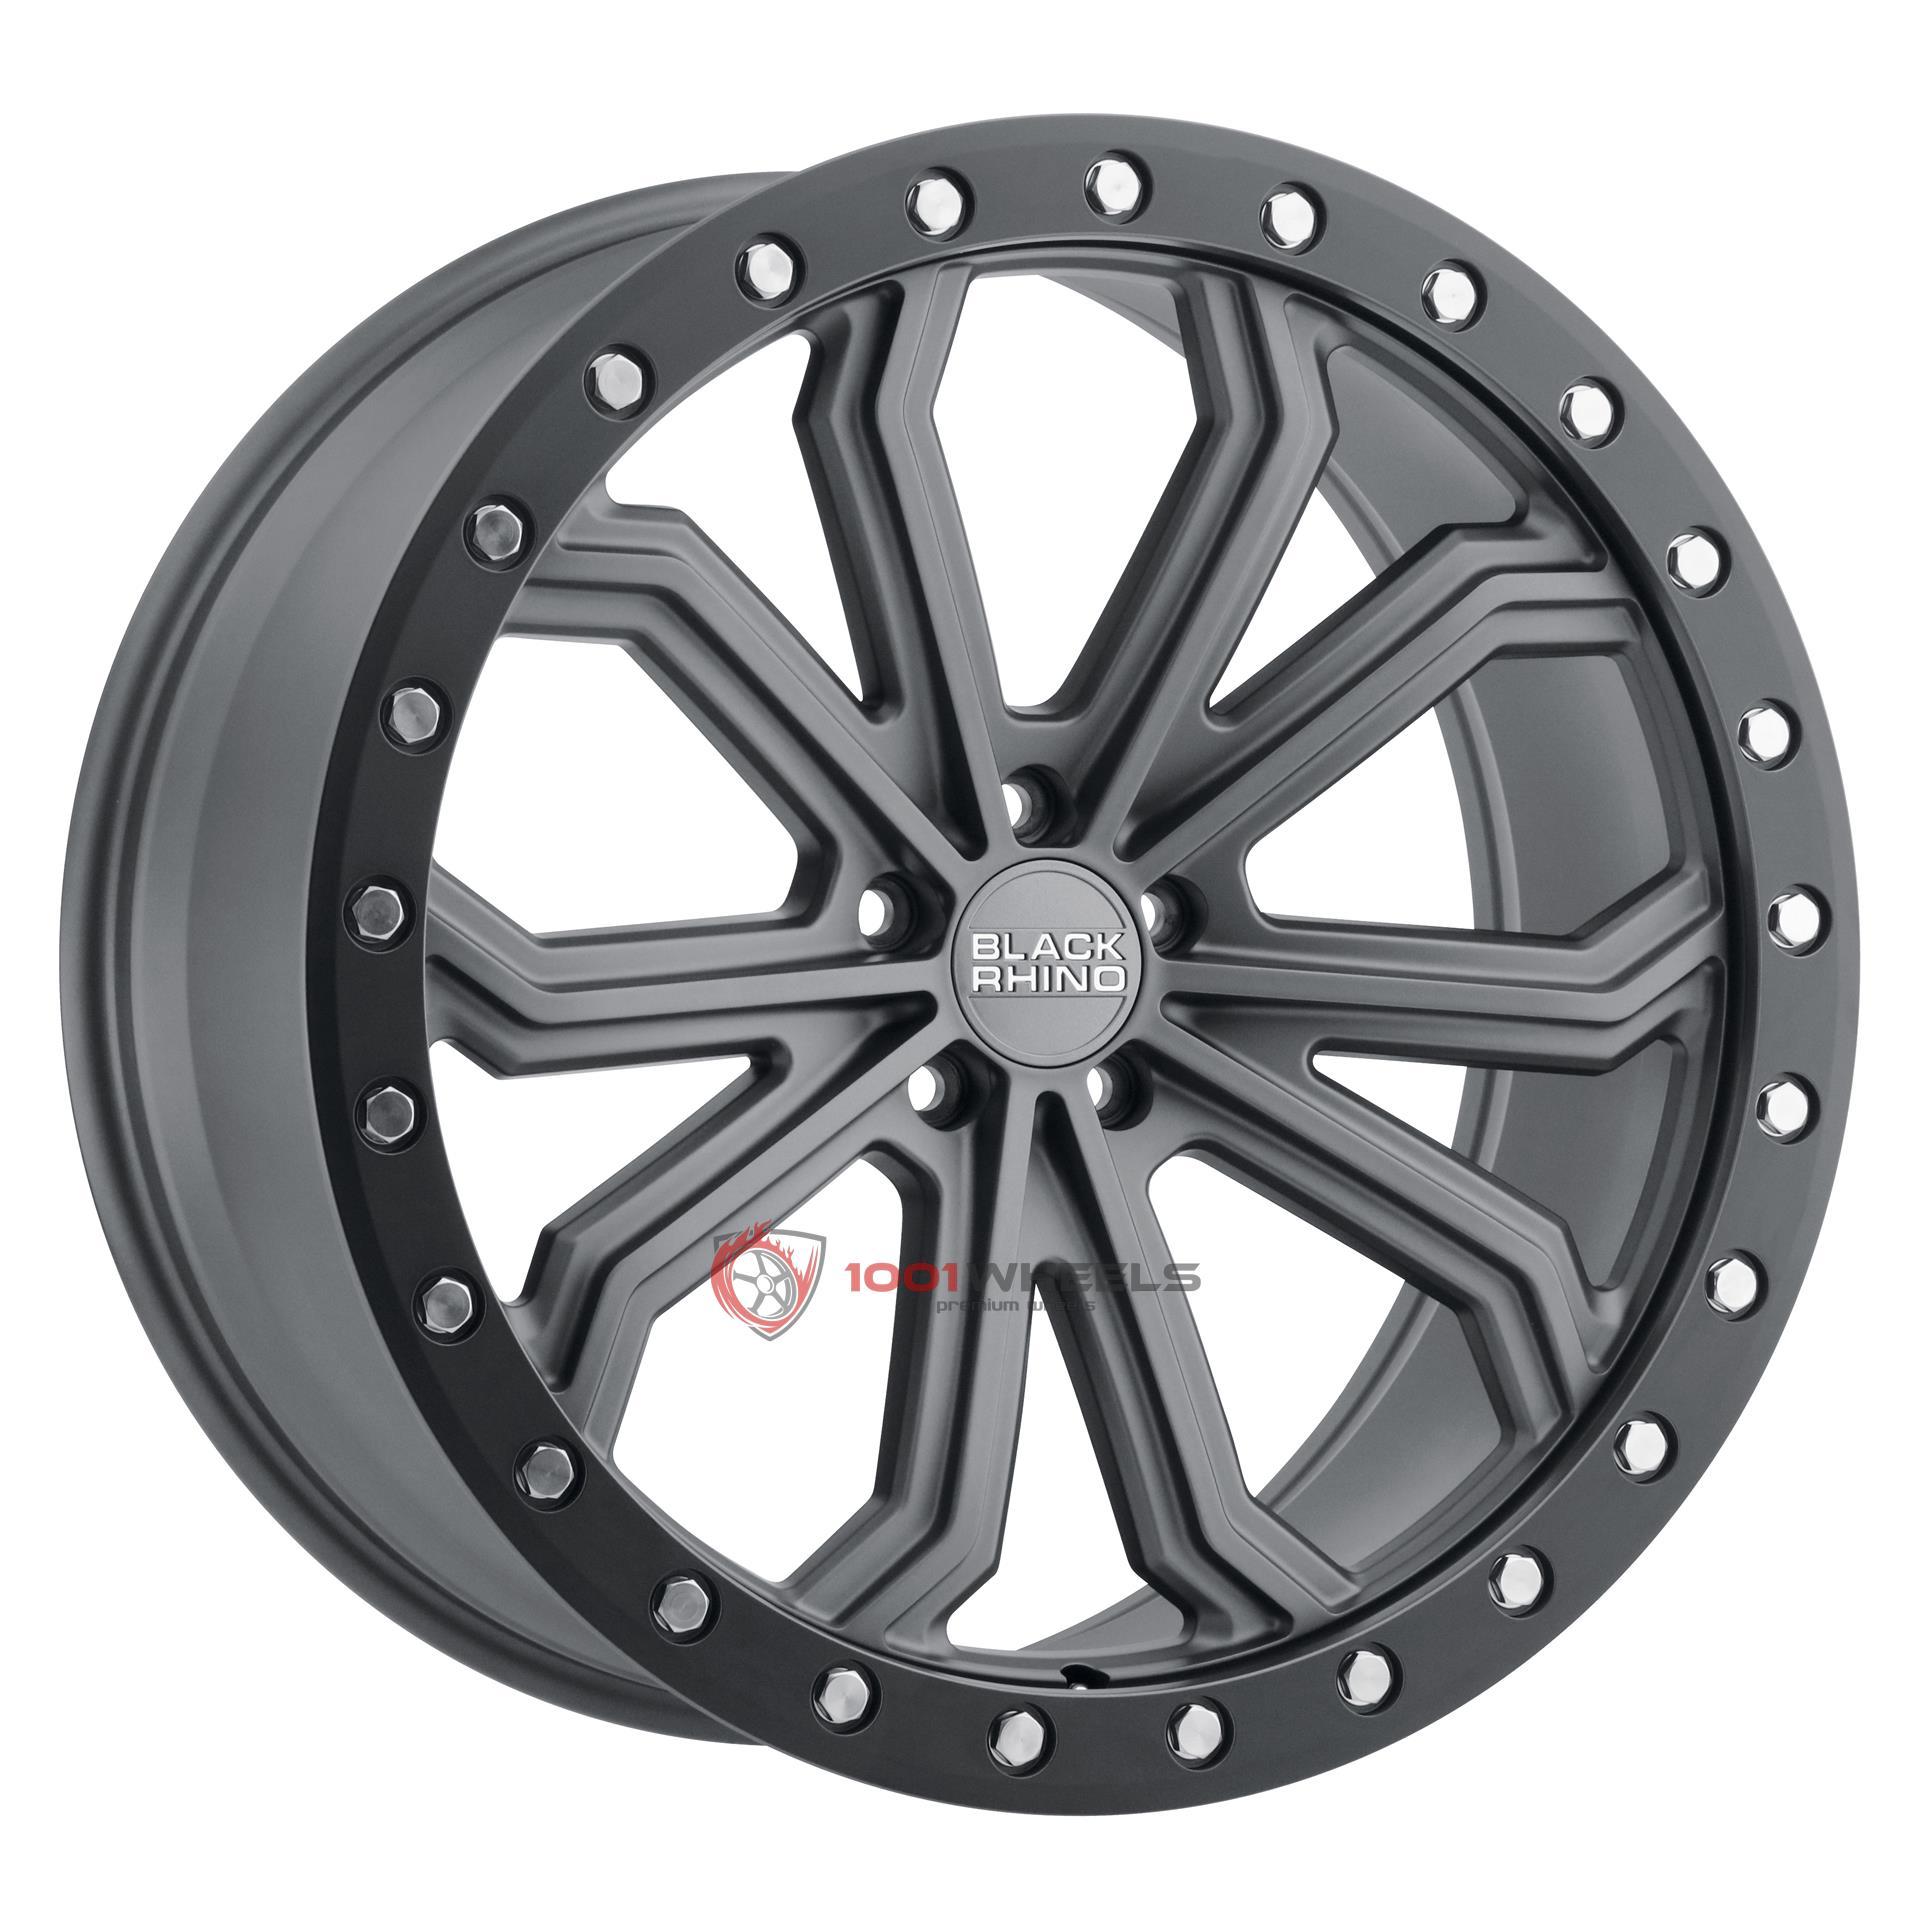 BLACK RHINO TRABUCO matte-gunmetal-wblack-lip-edge-and-silver-bolts